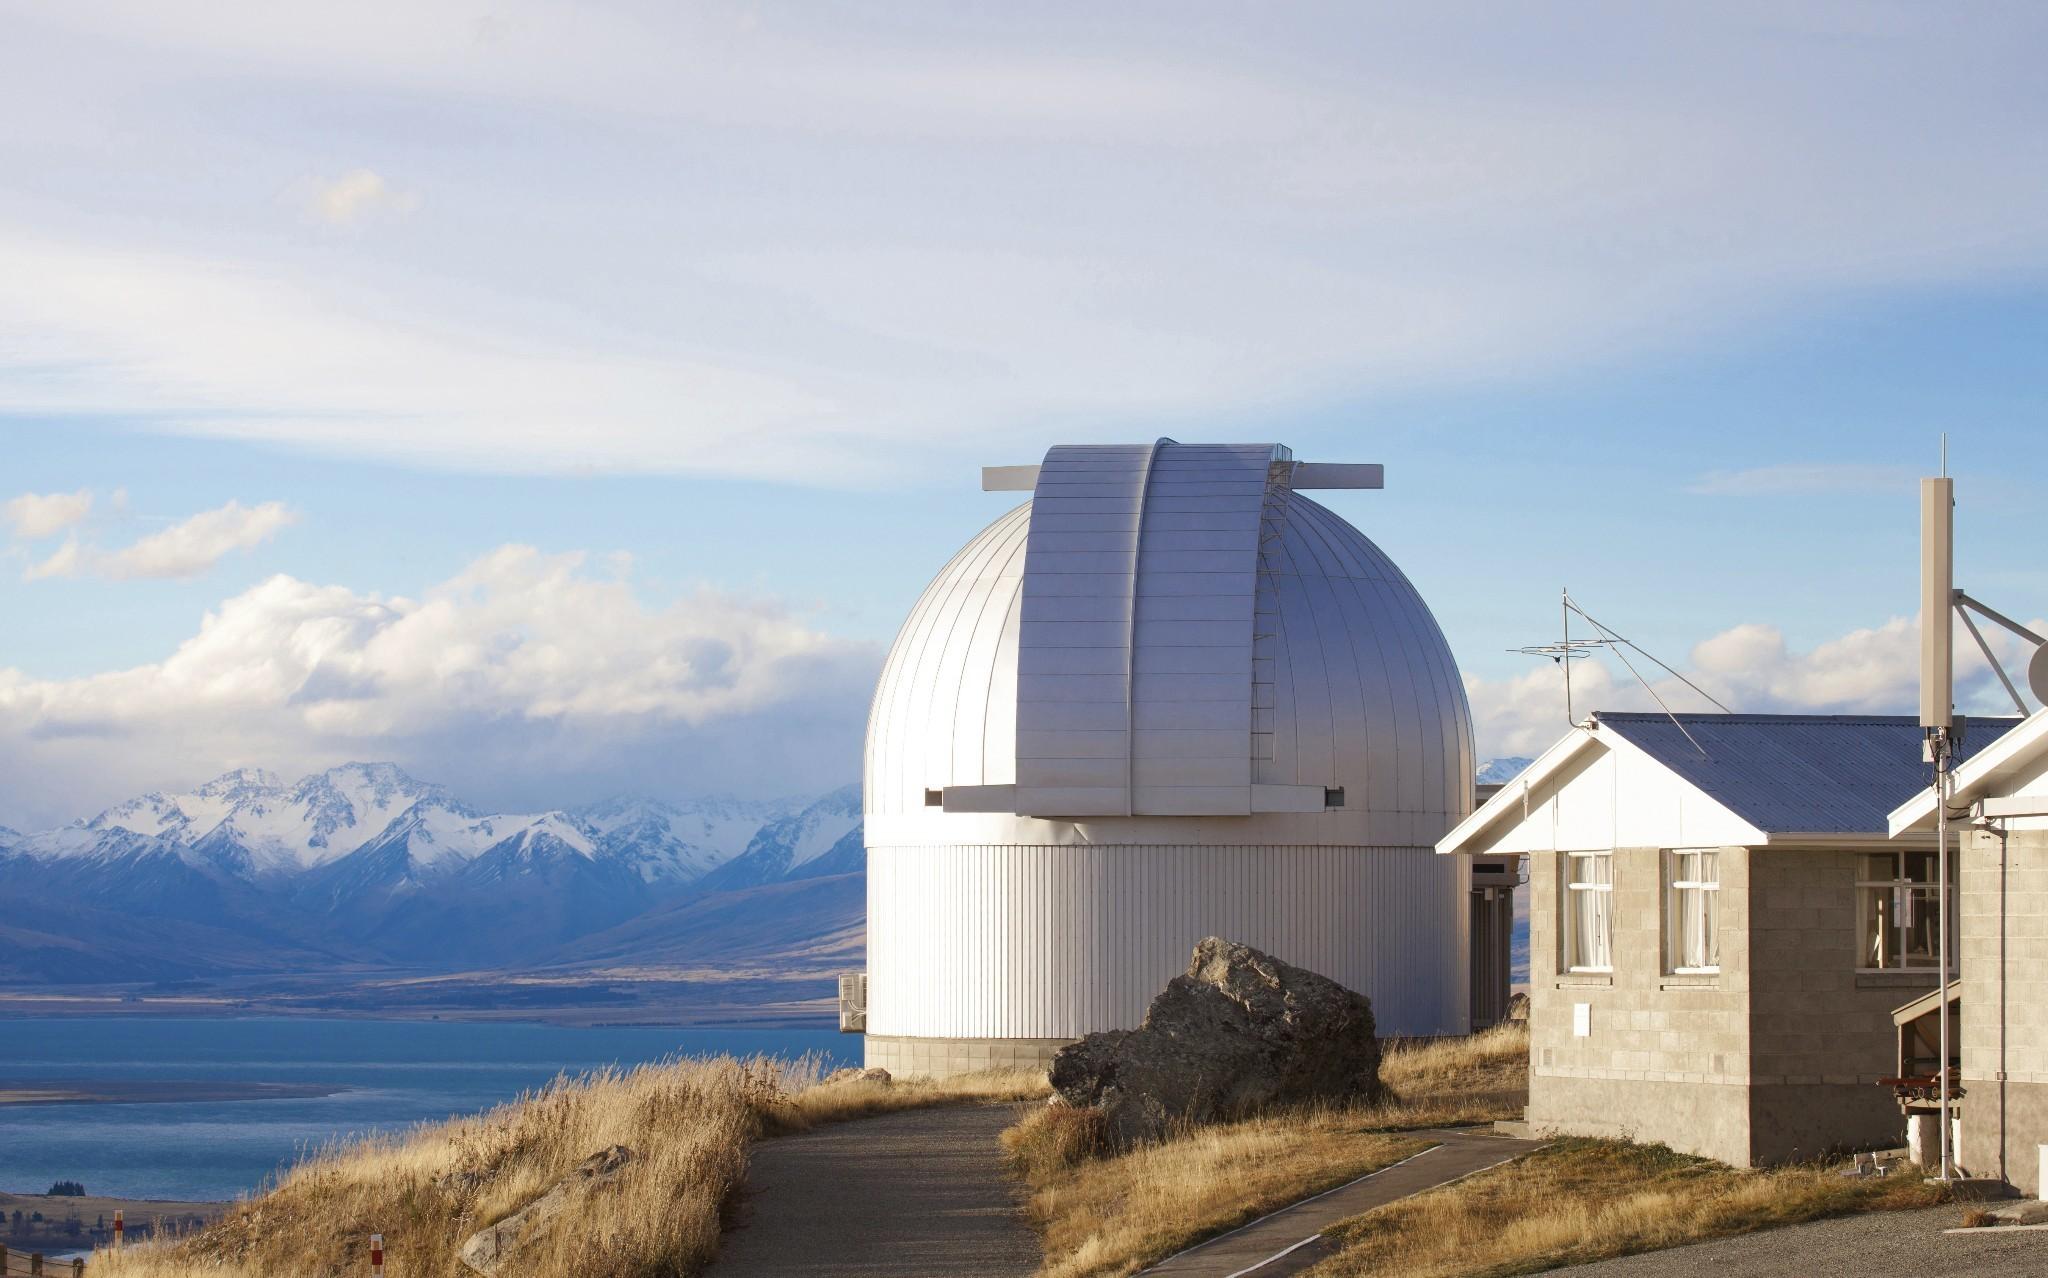 Best views in New Zealand: 10 great lookouts